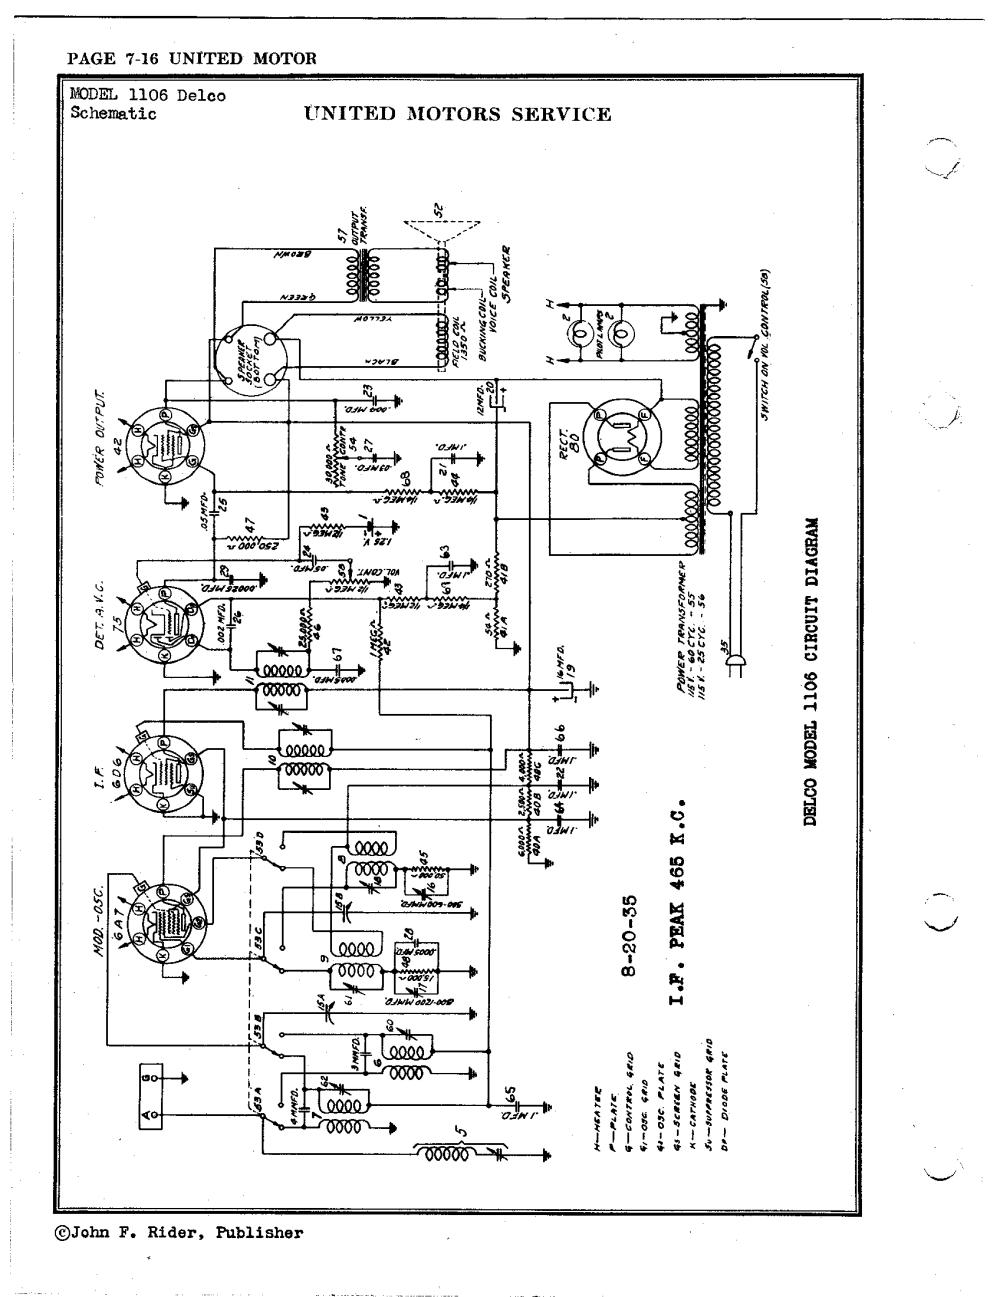 medium resolution of delco radio schematics wiring diagram log delco radio schematics